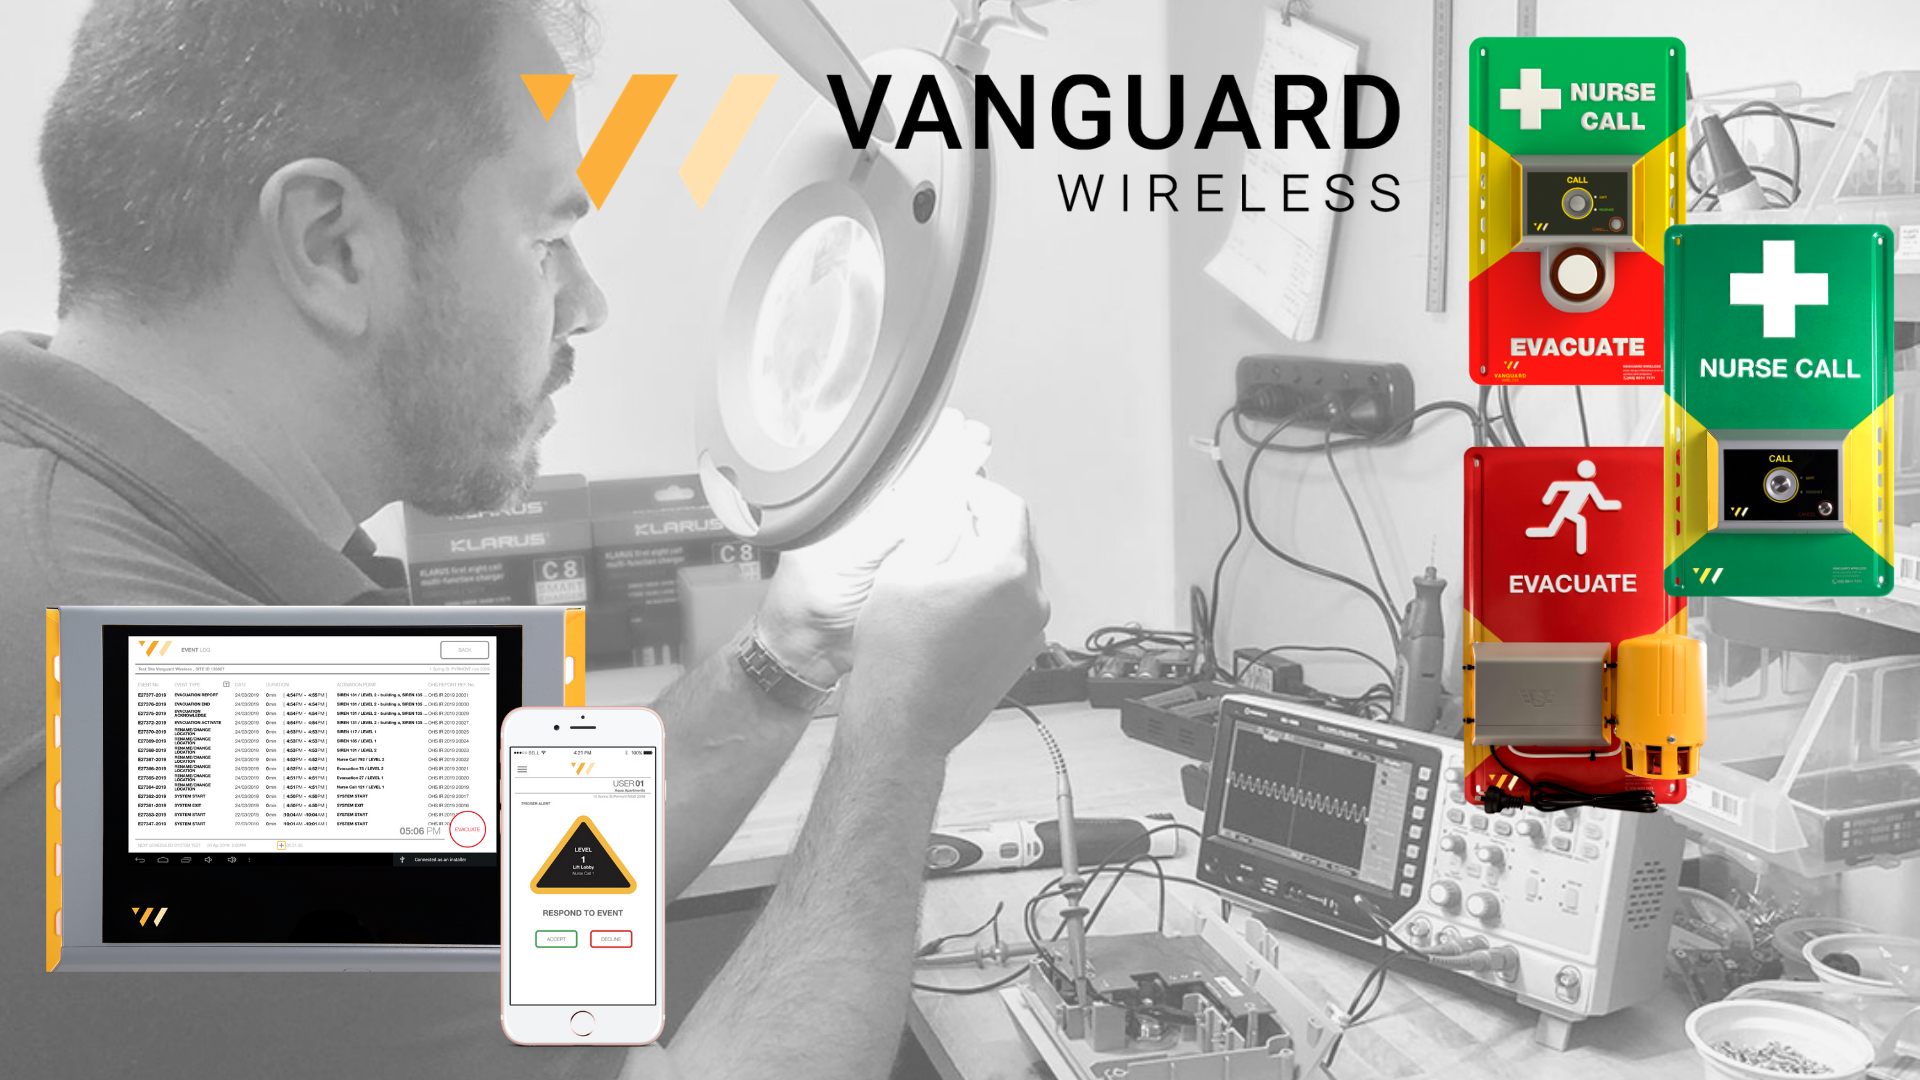 Two Minutes With Igor Kazagrandi - Vanguard Wireless CEO